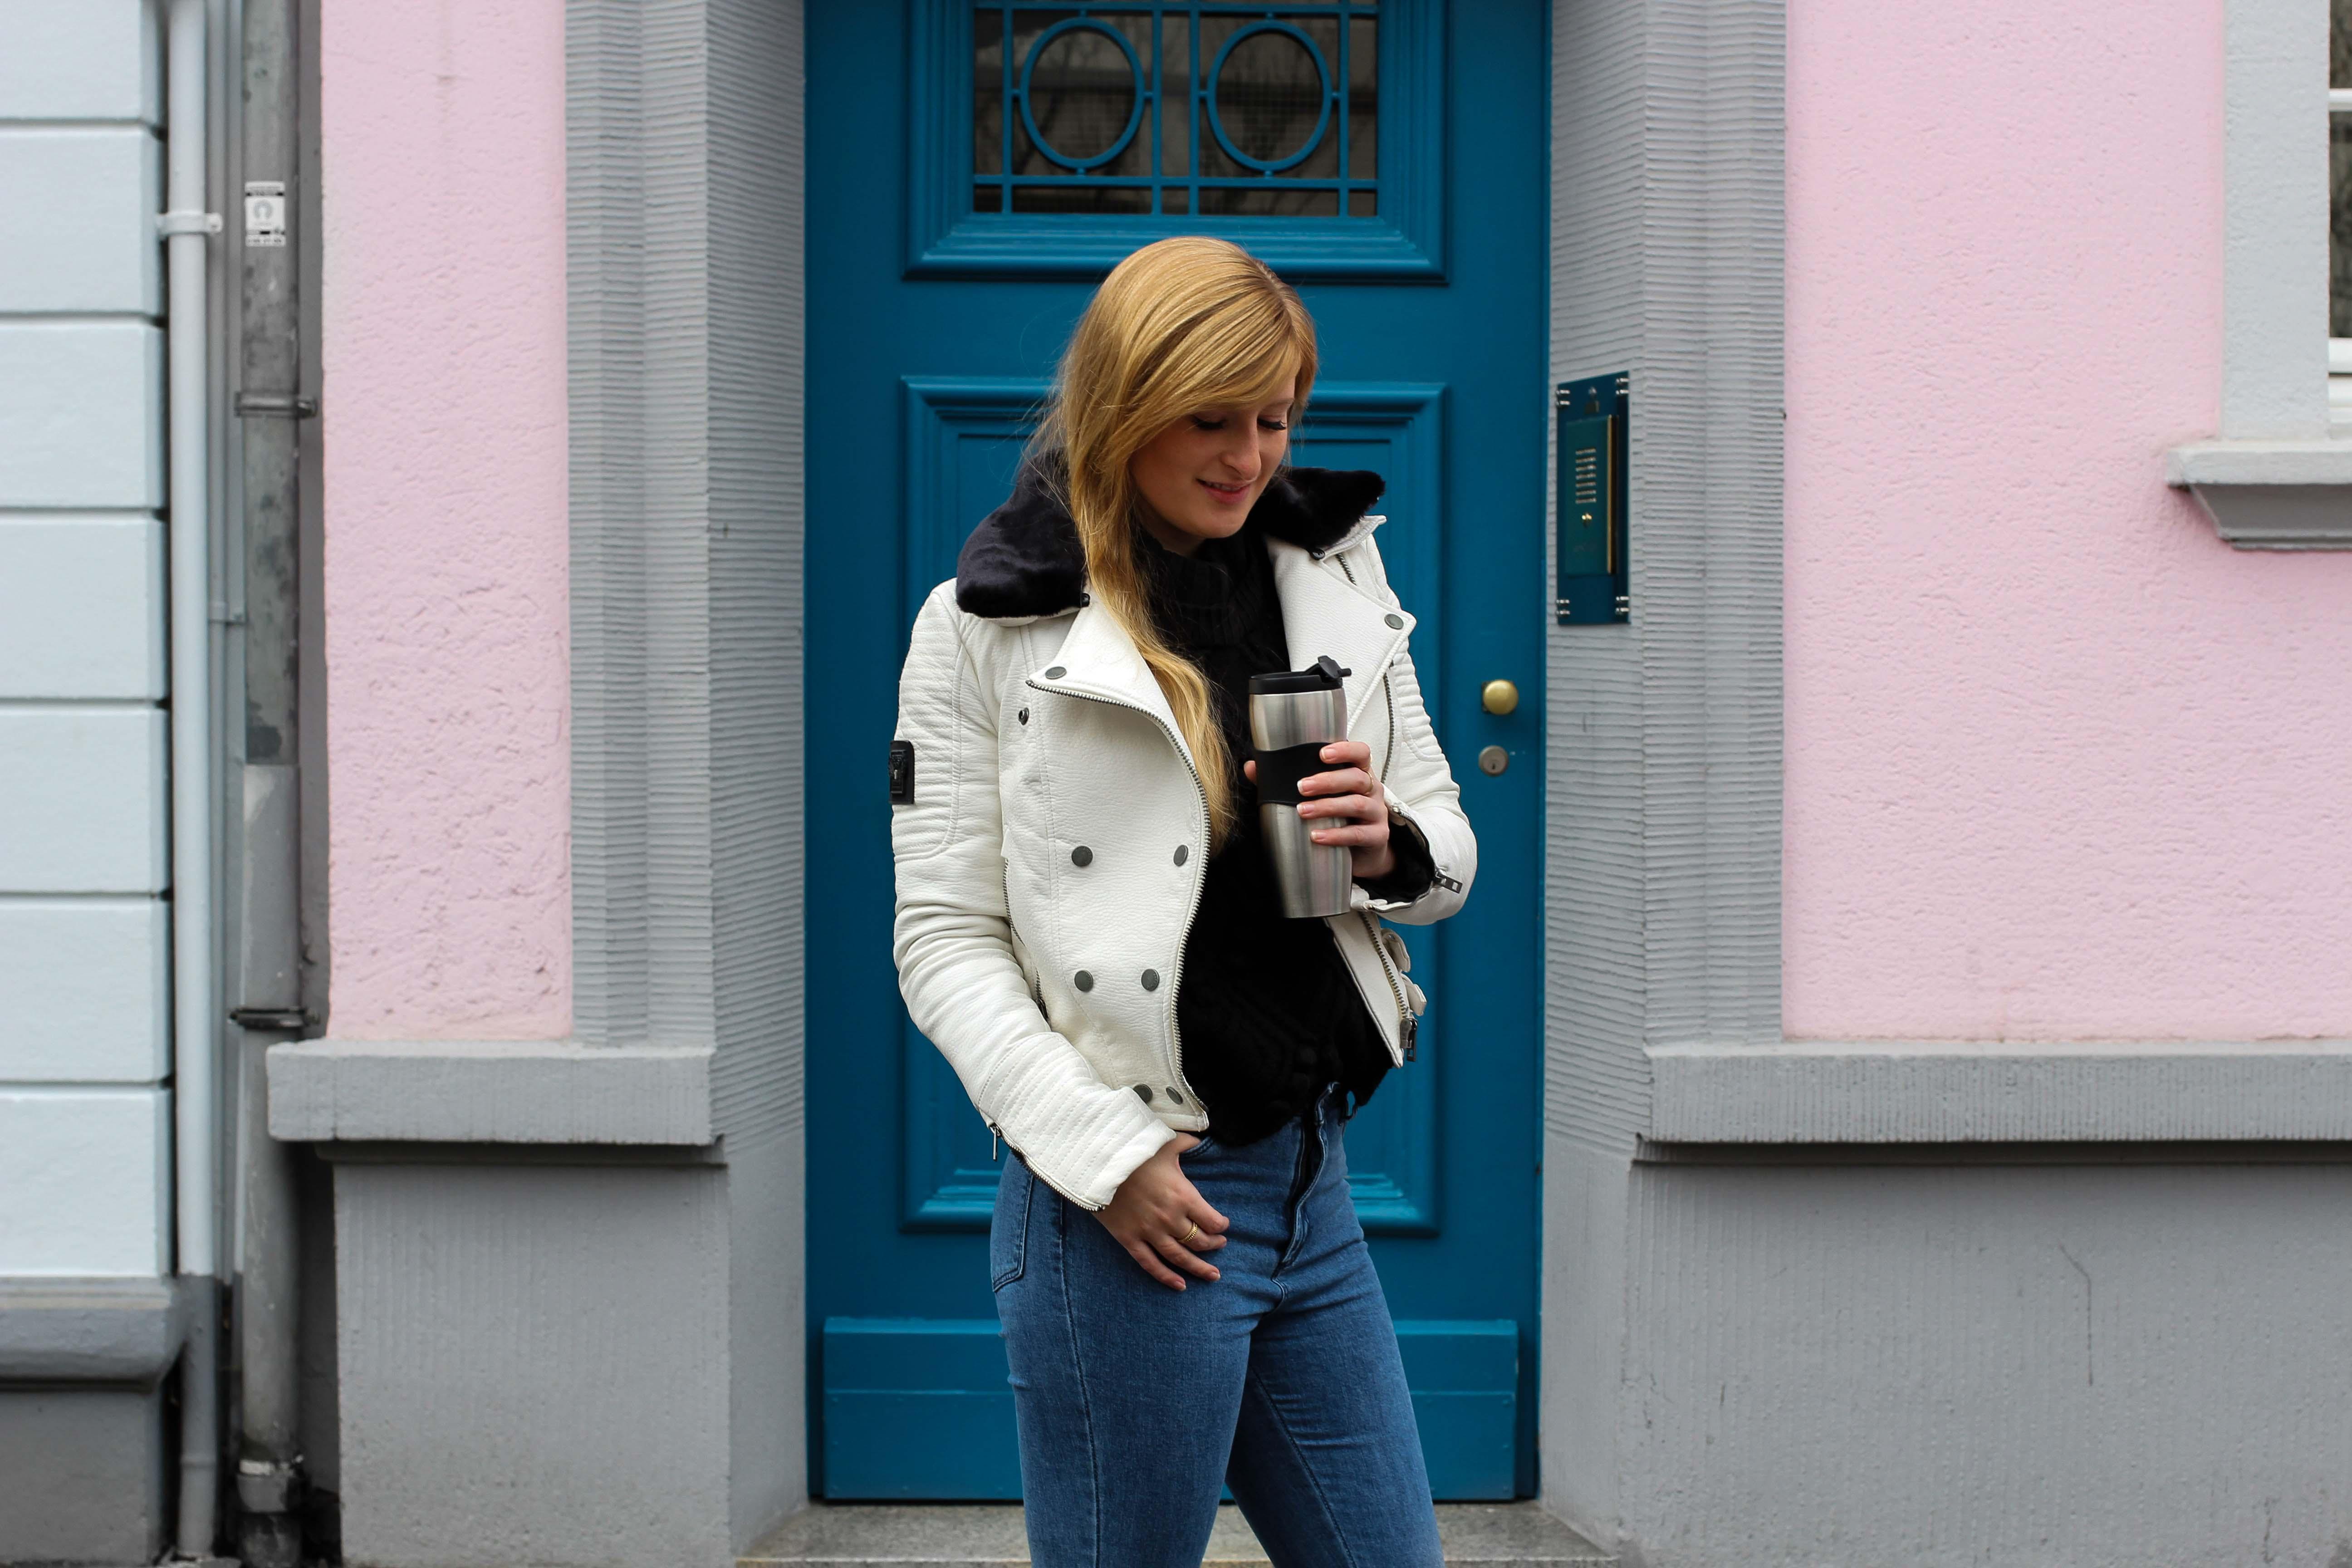 Weiße Lederjacke kombinieren Blaue Highwaist Jeans blaue Tür Casual Streetstyle Modeblog Bonn 4